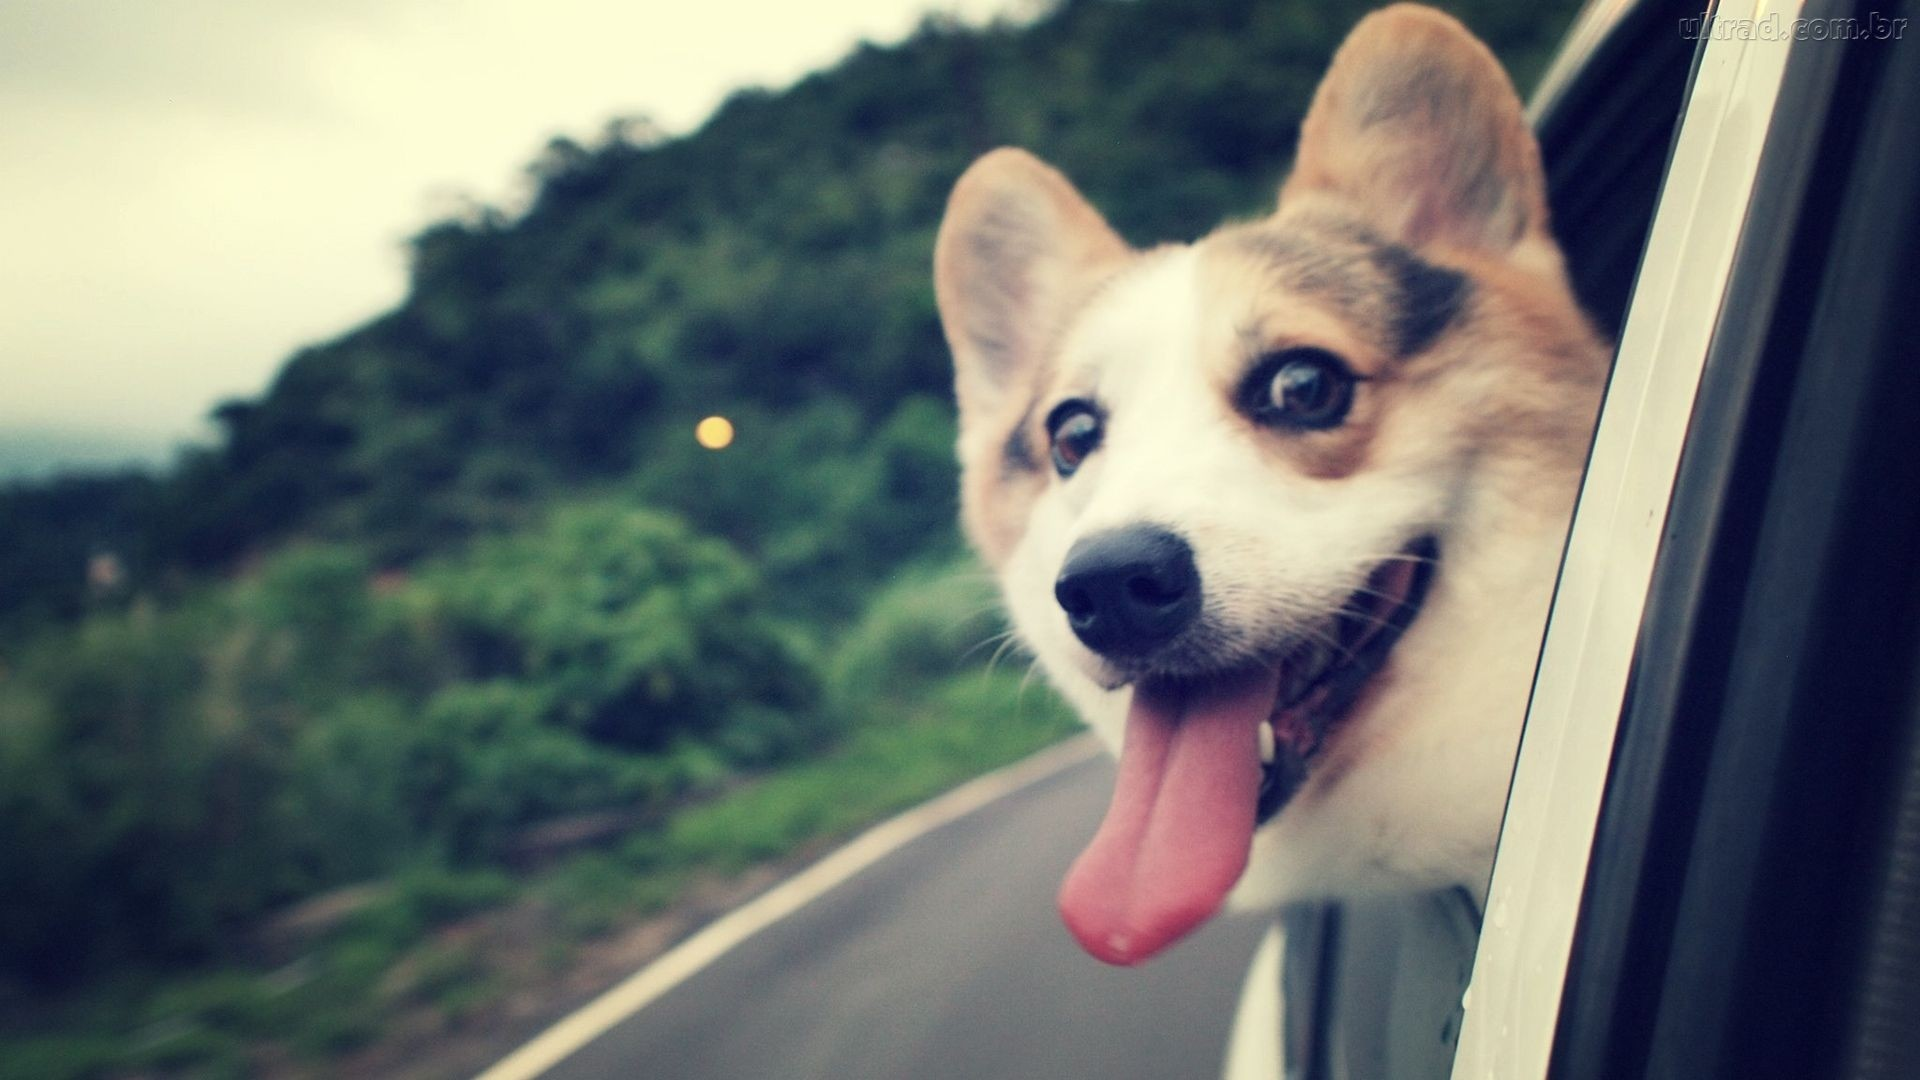 Keys: doge, internet, wallpaper, wallpapers, animals